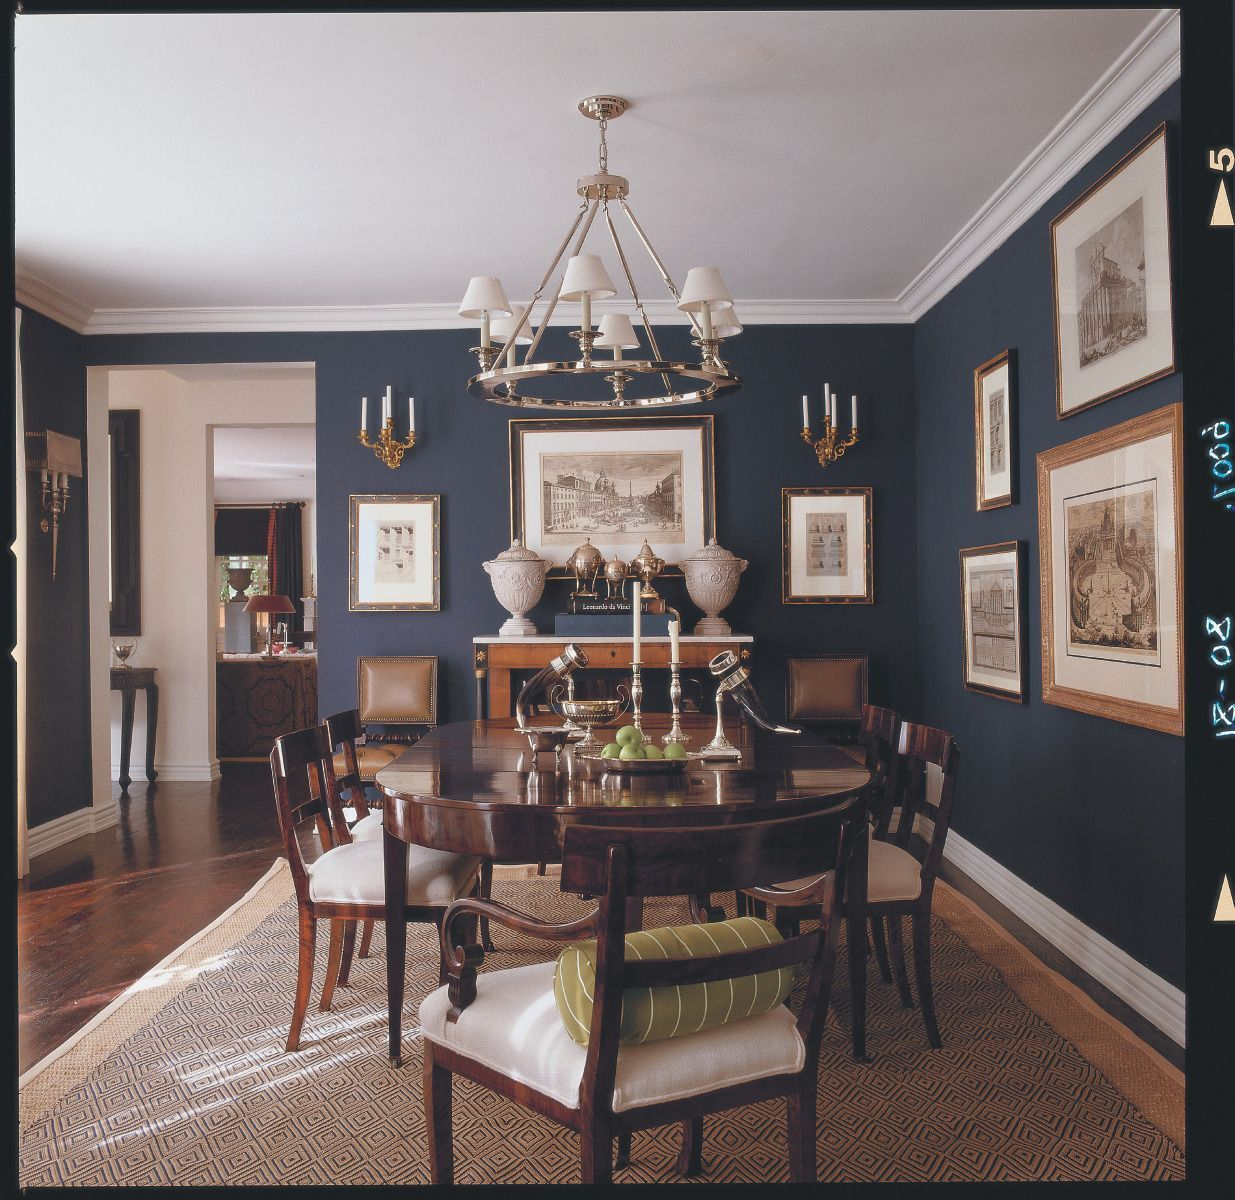 26 Elegant Colorful Dining Room Design Ideas Dining Room Blue Dark Blue Dining Room Blue Dining Room Walls